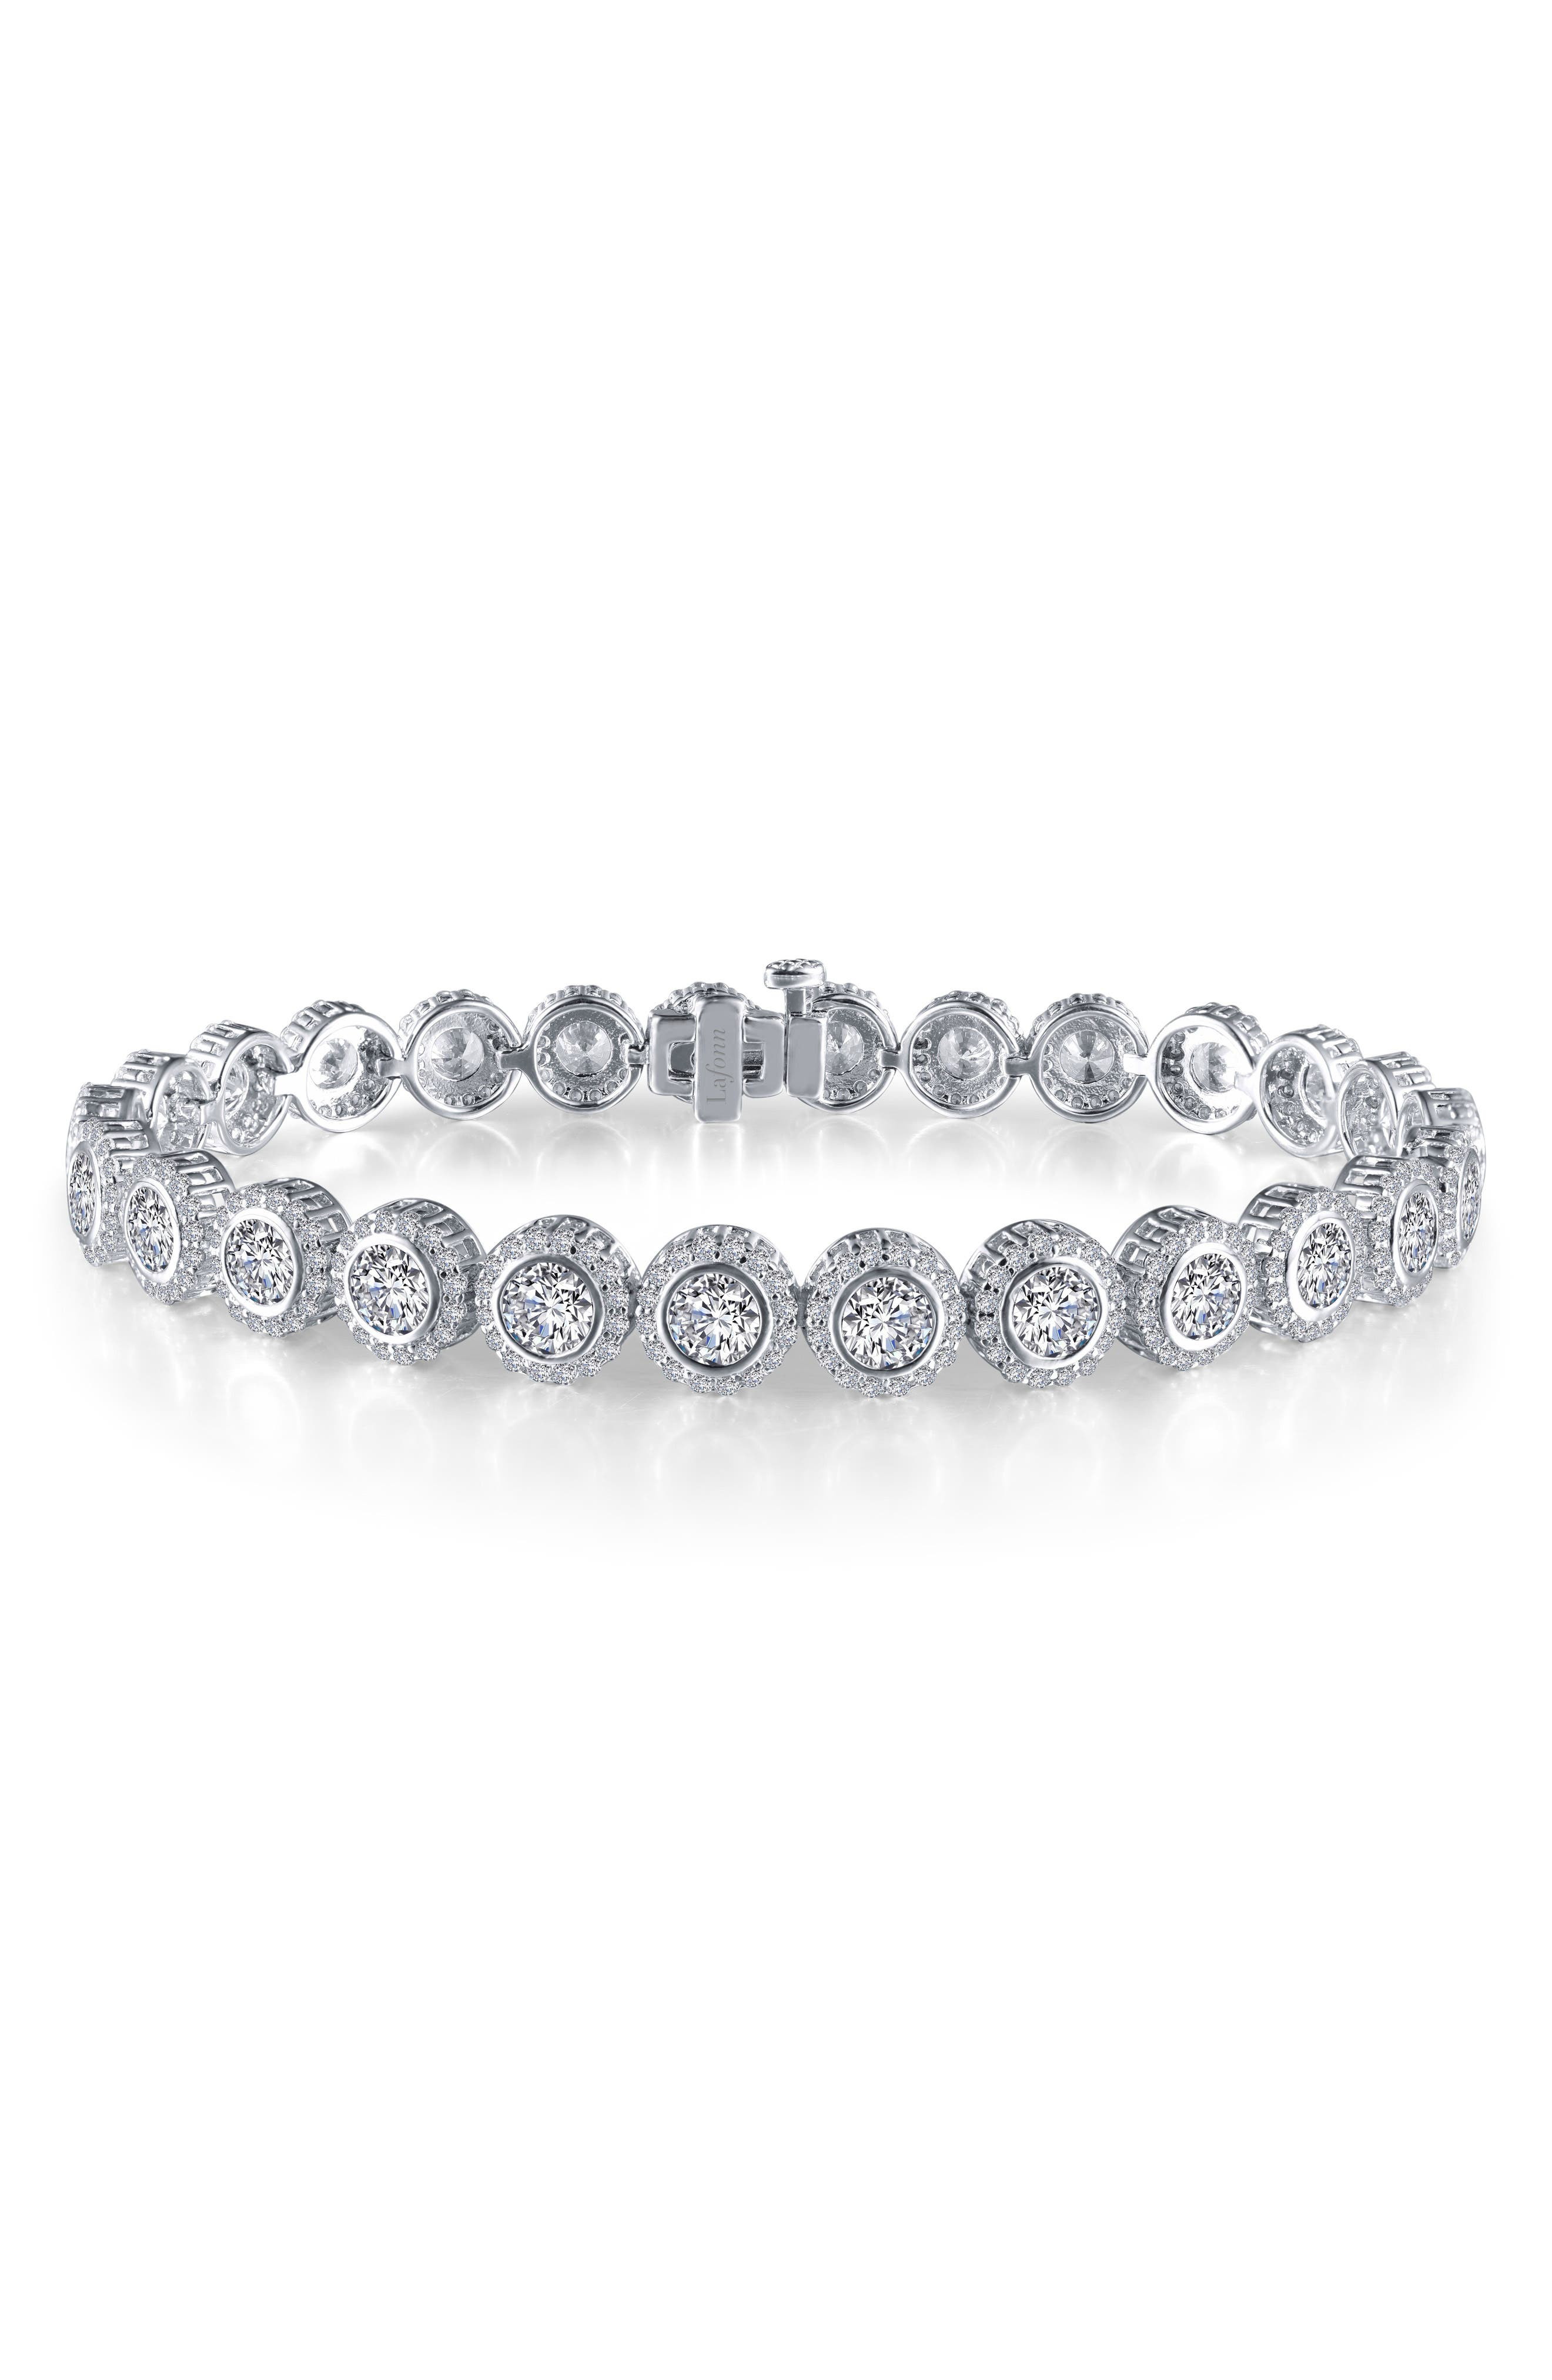 Halo Simulated Diamond Tennis Bracelet,                         Main,                         color, SILVER/ CLEAR